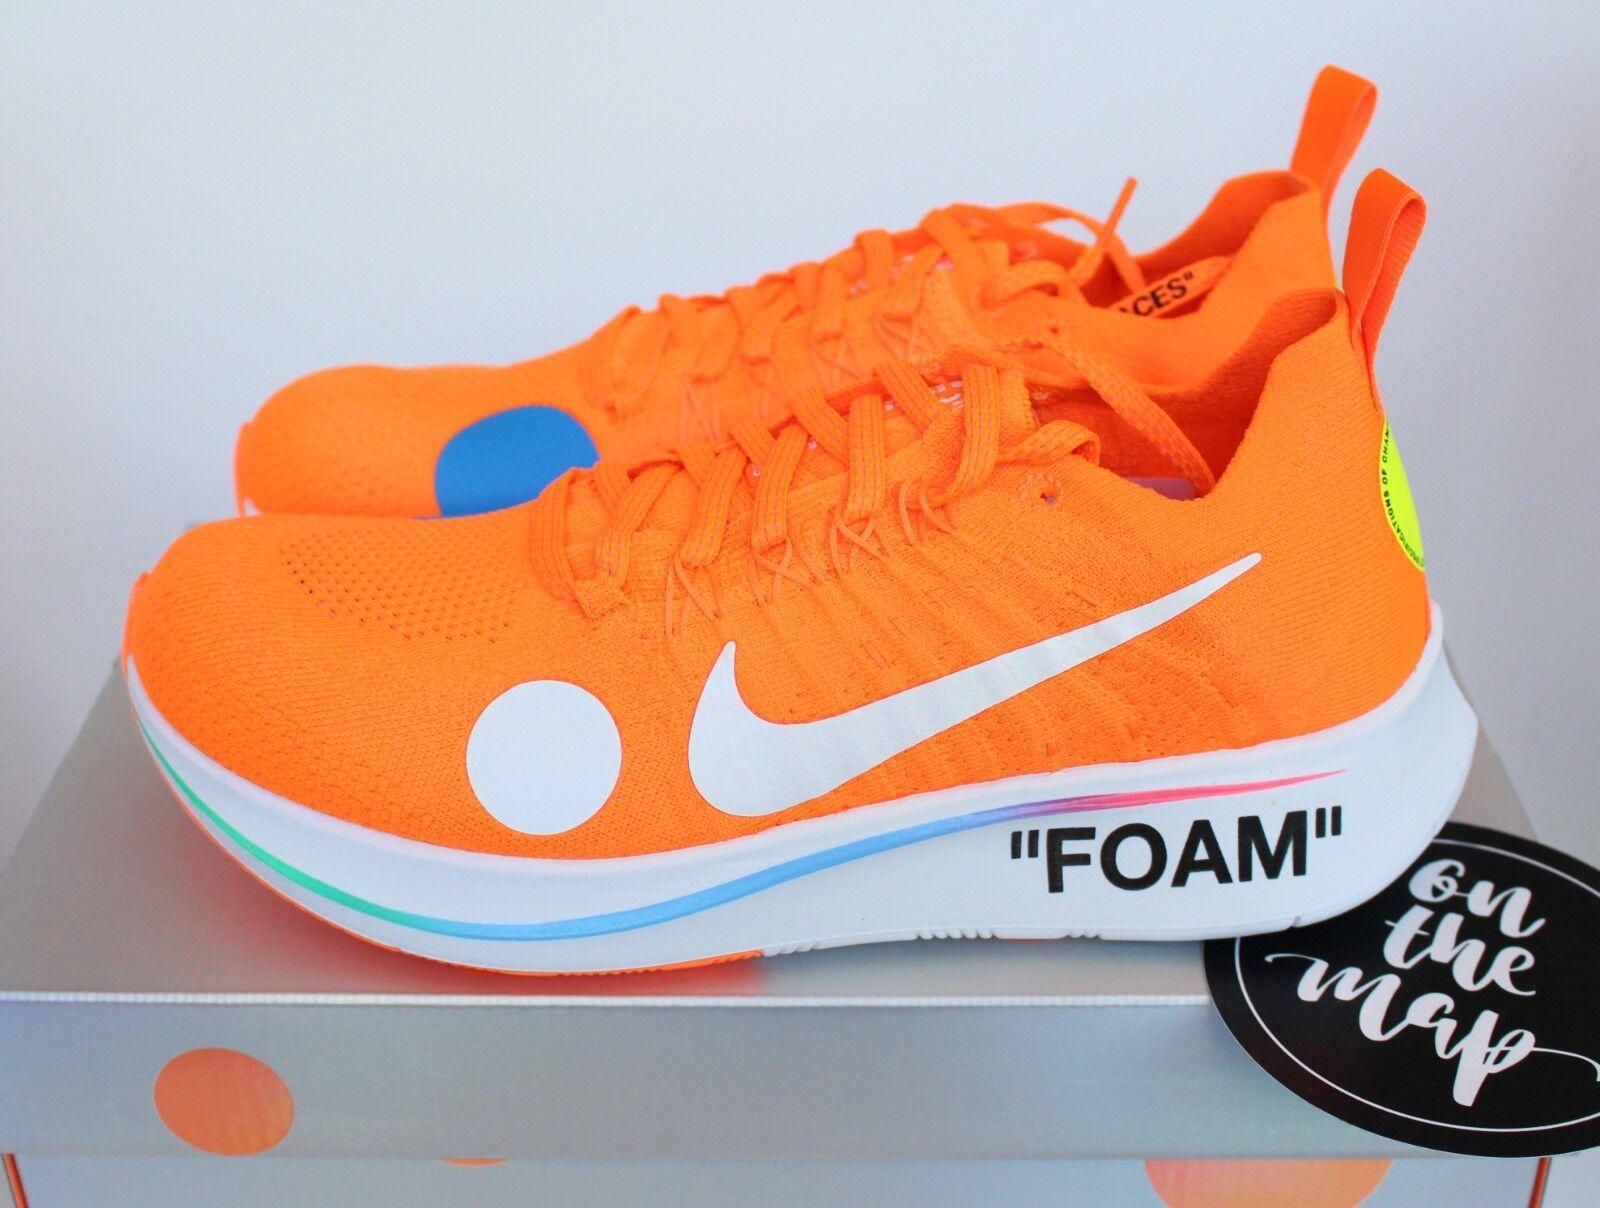 Nike Off Weiß Zoom Fly Mercurial Flyknit Virgil Orange UK 5 7 8 10 11 US New Elegant und feierlich